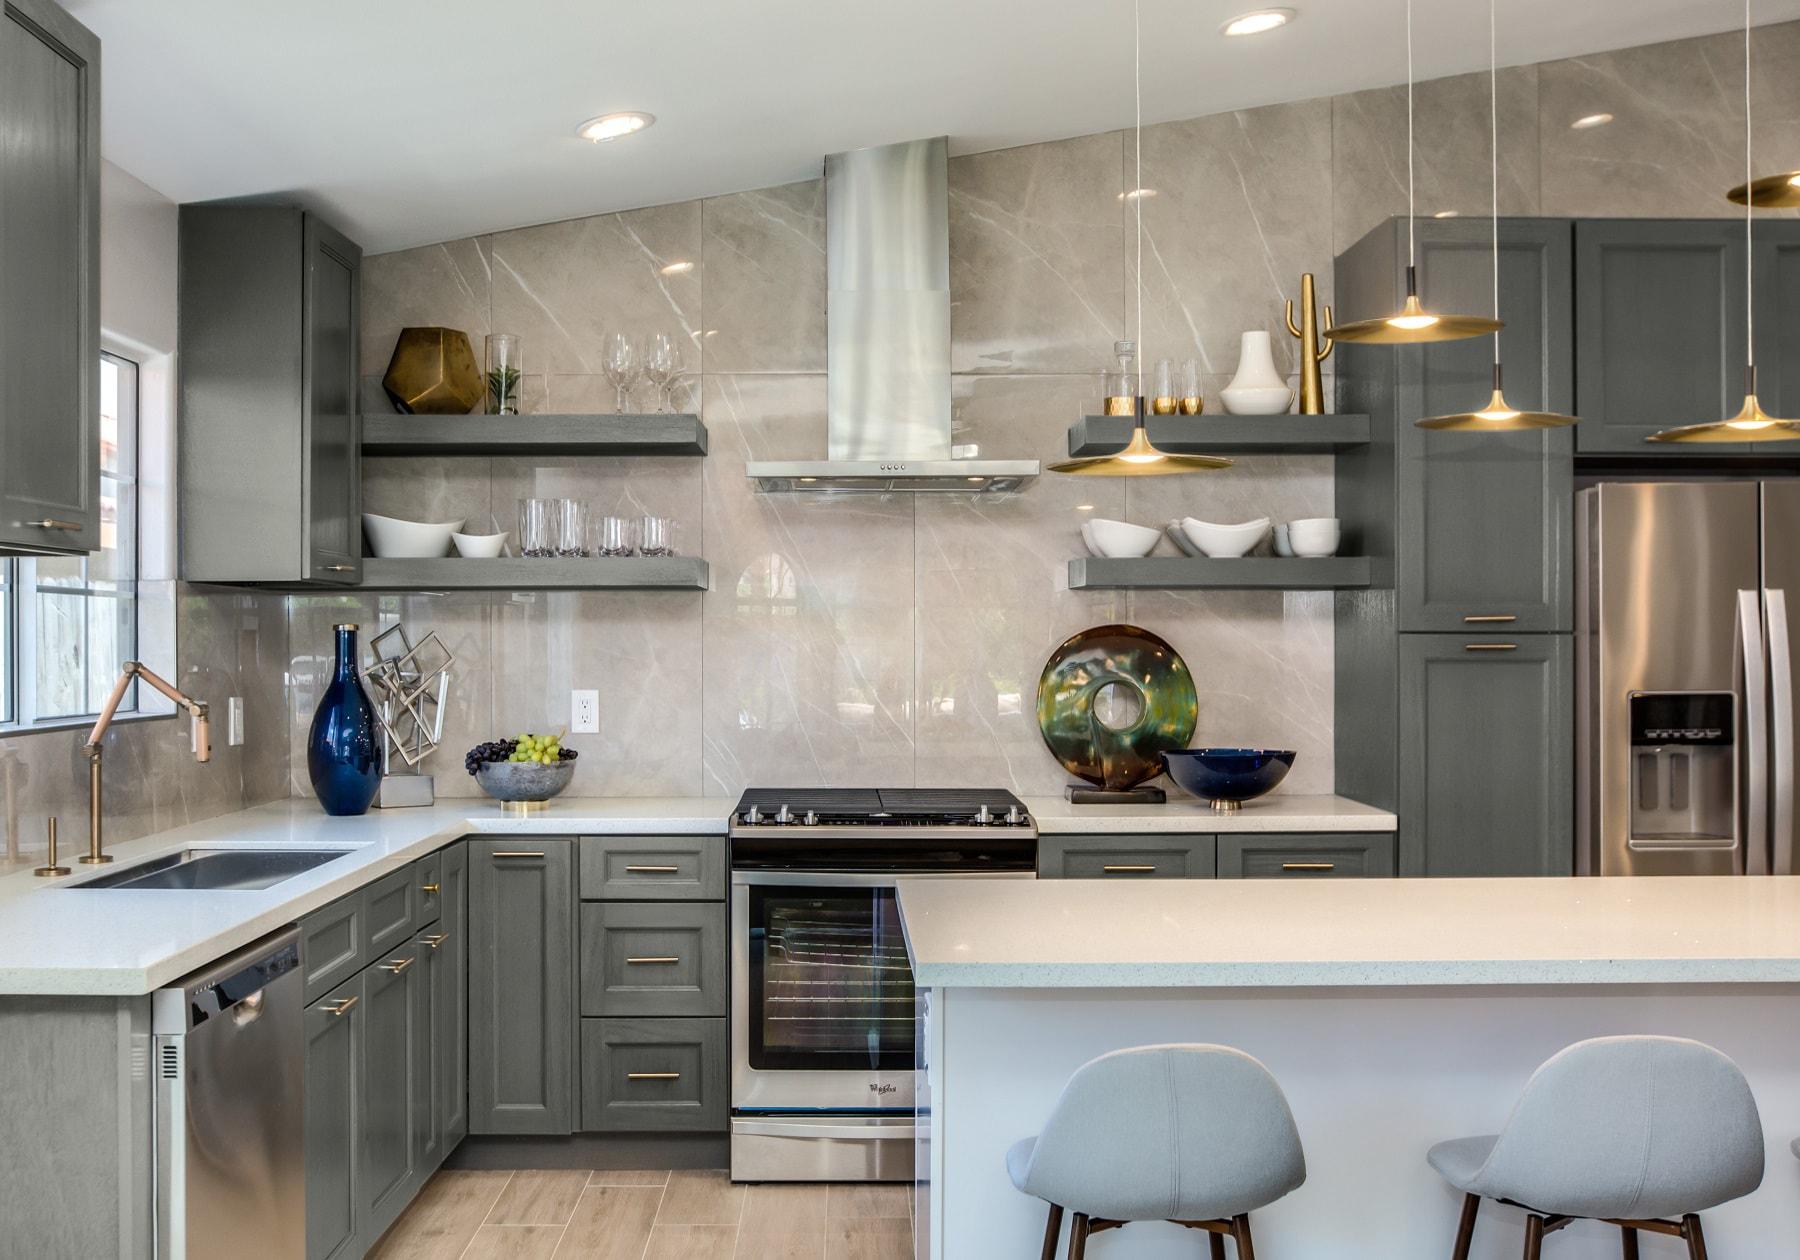 A Deslaurier kitchen featuring Crestfield cabinet doors.